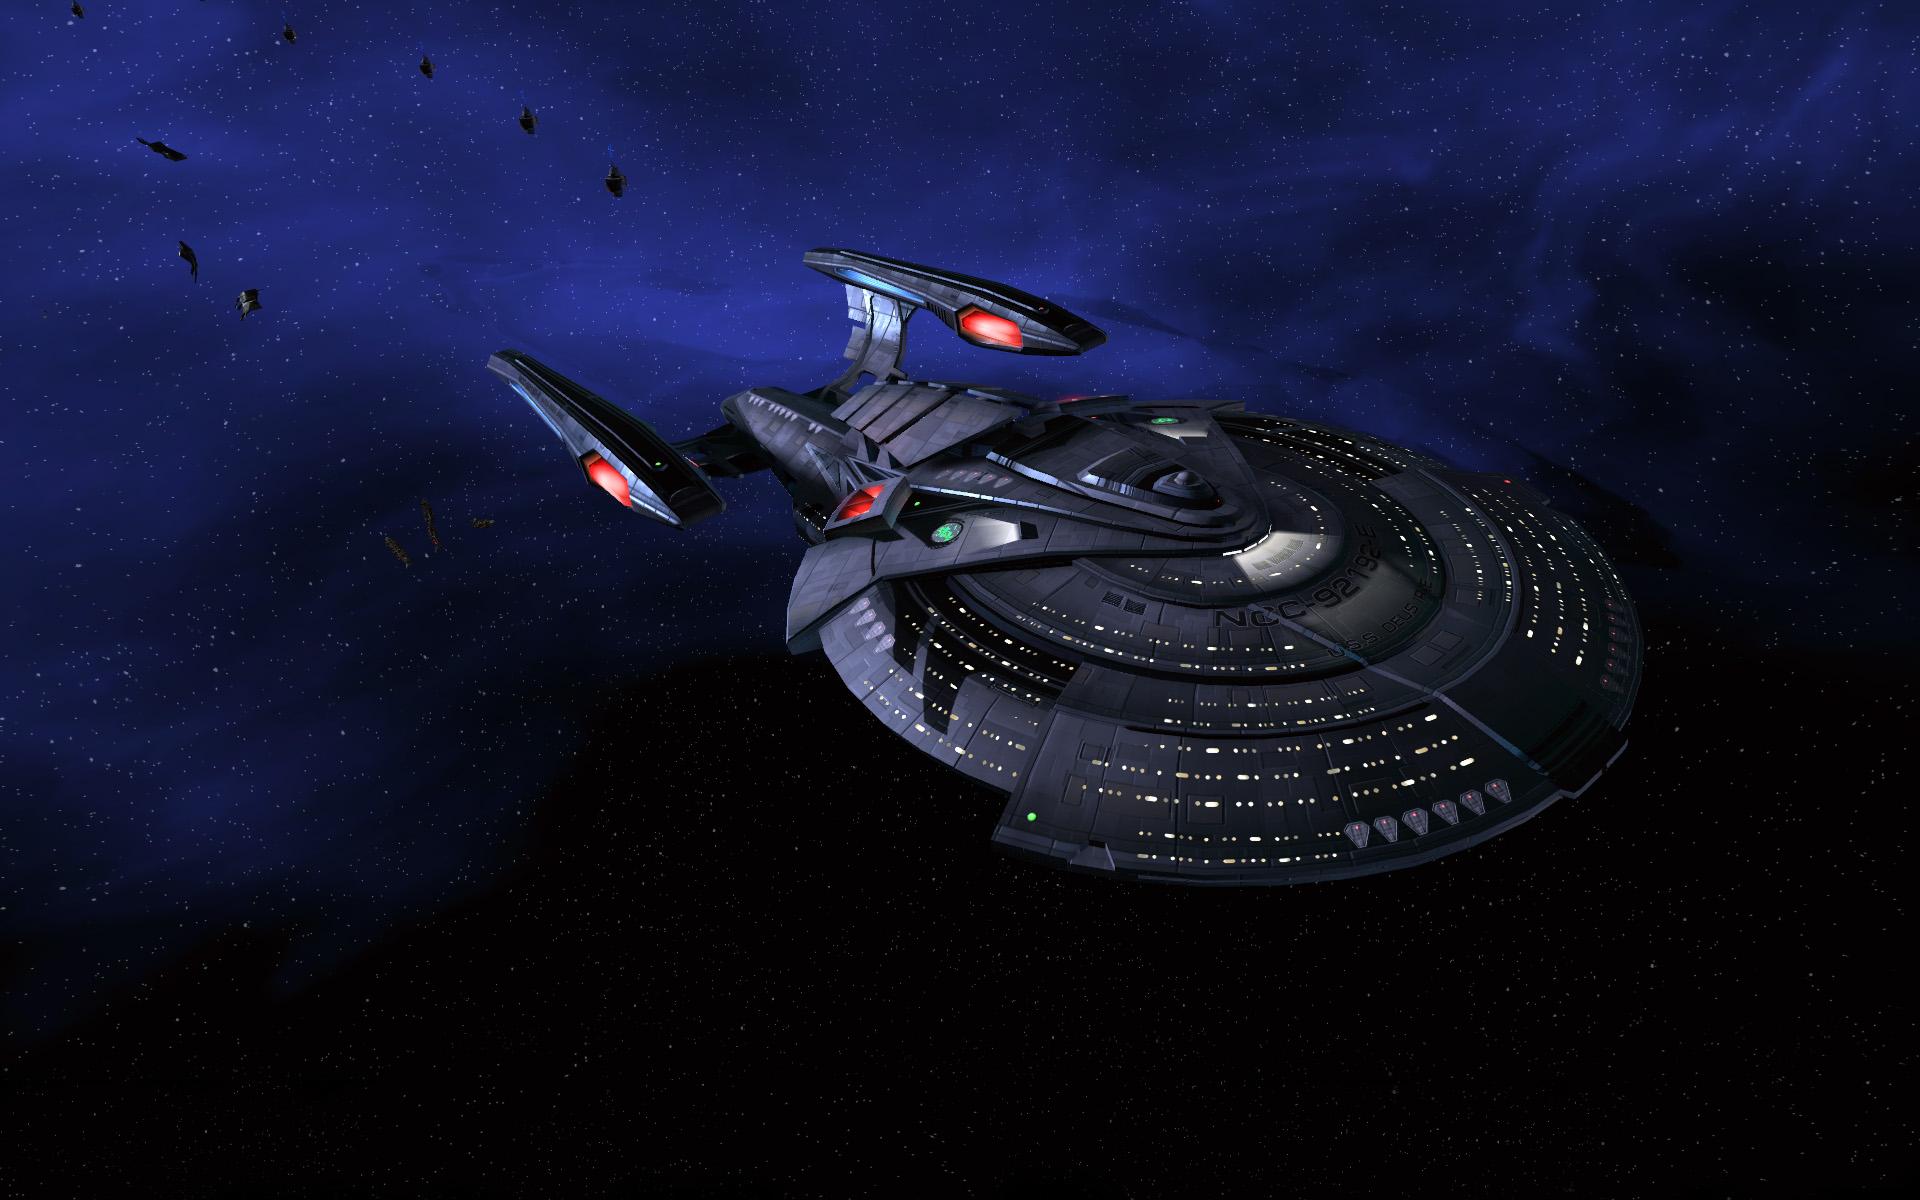 Movies Screen Saver Voyager Trek Widescreen Star wallpapers HD 1920x1200